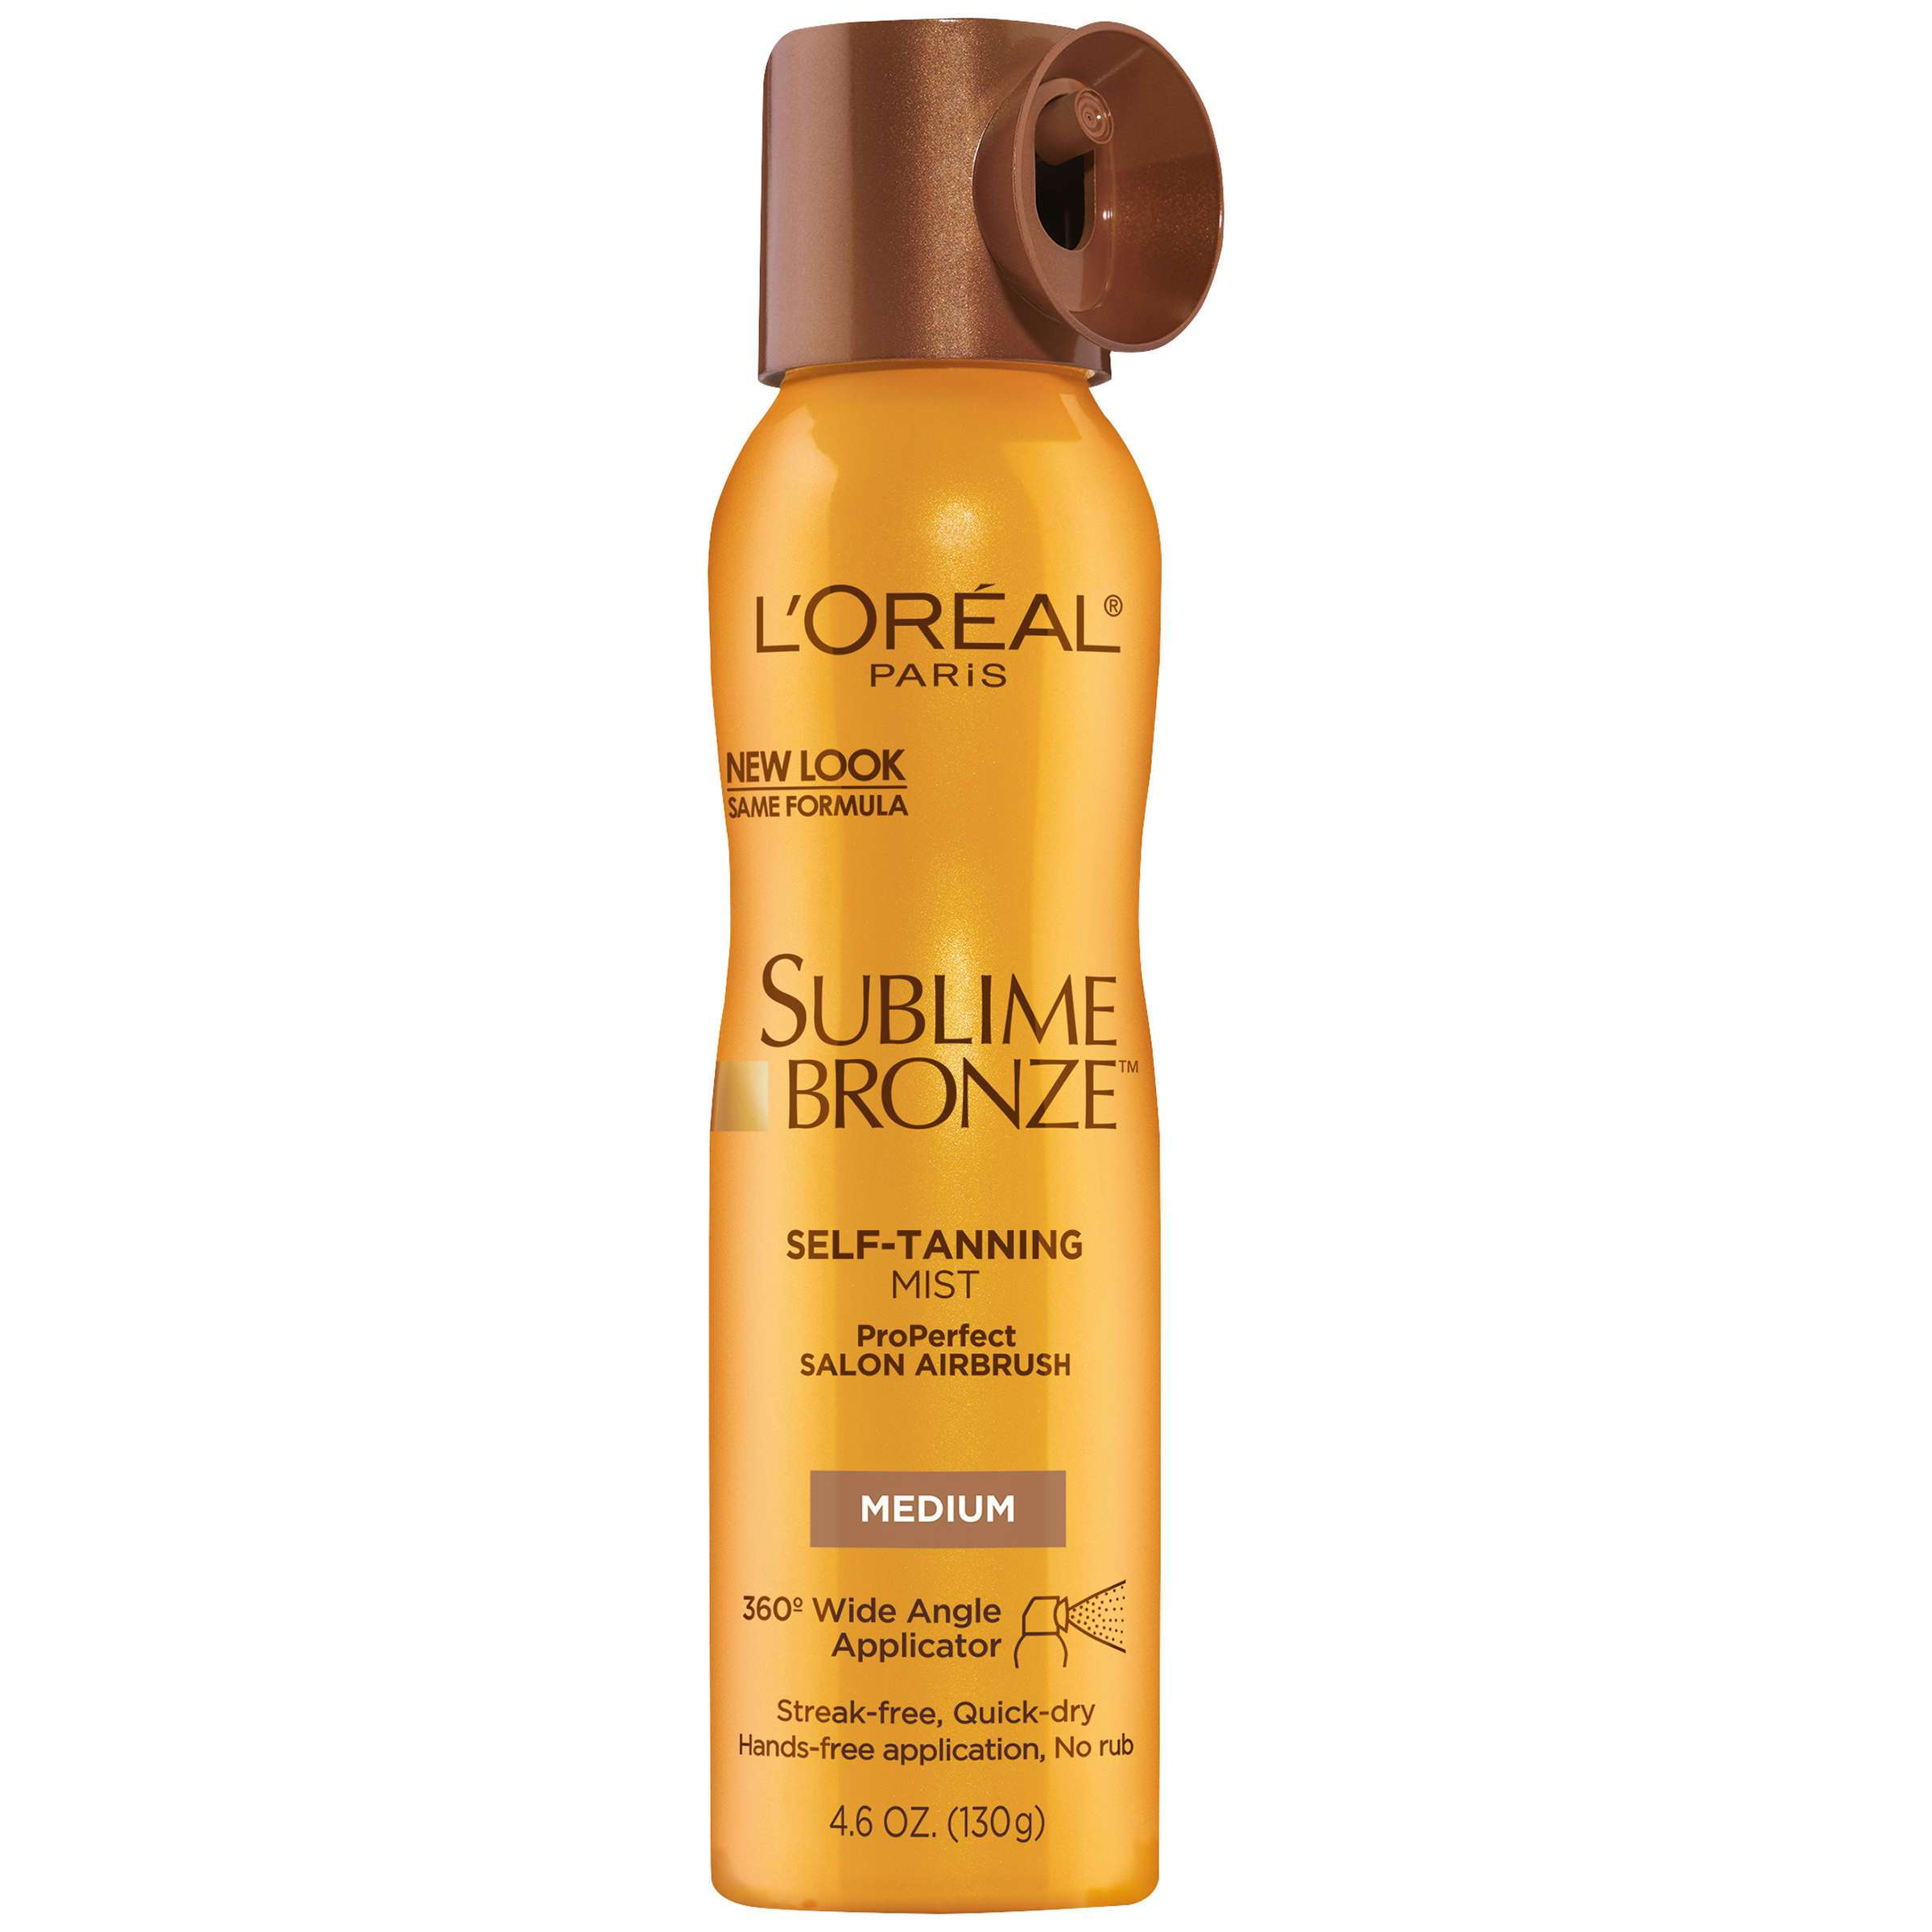 L'Oreal Paris Sublime Bronze ProPerfect Salon Airbrush Self Tanning Mist